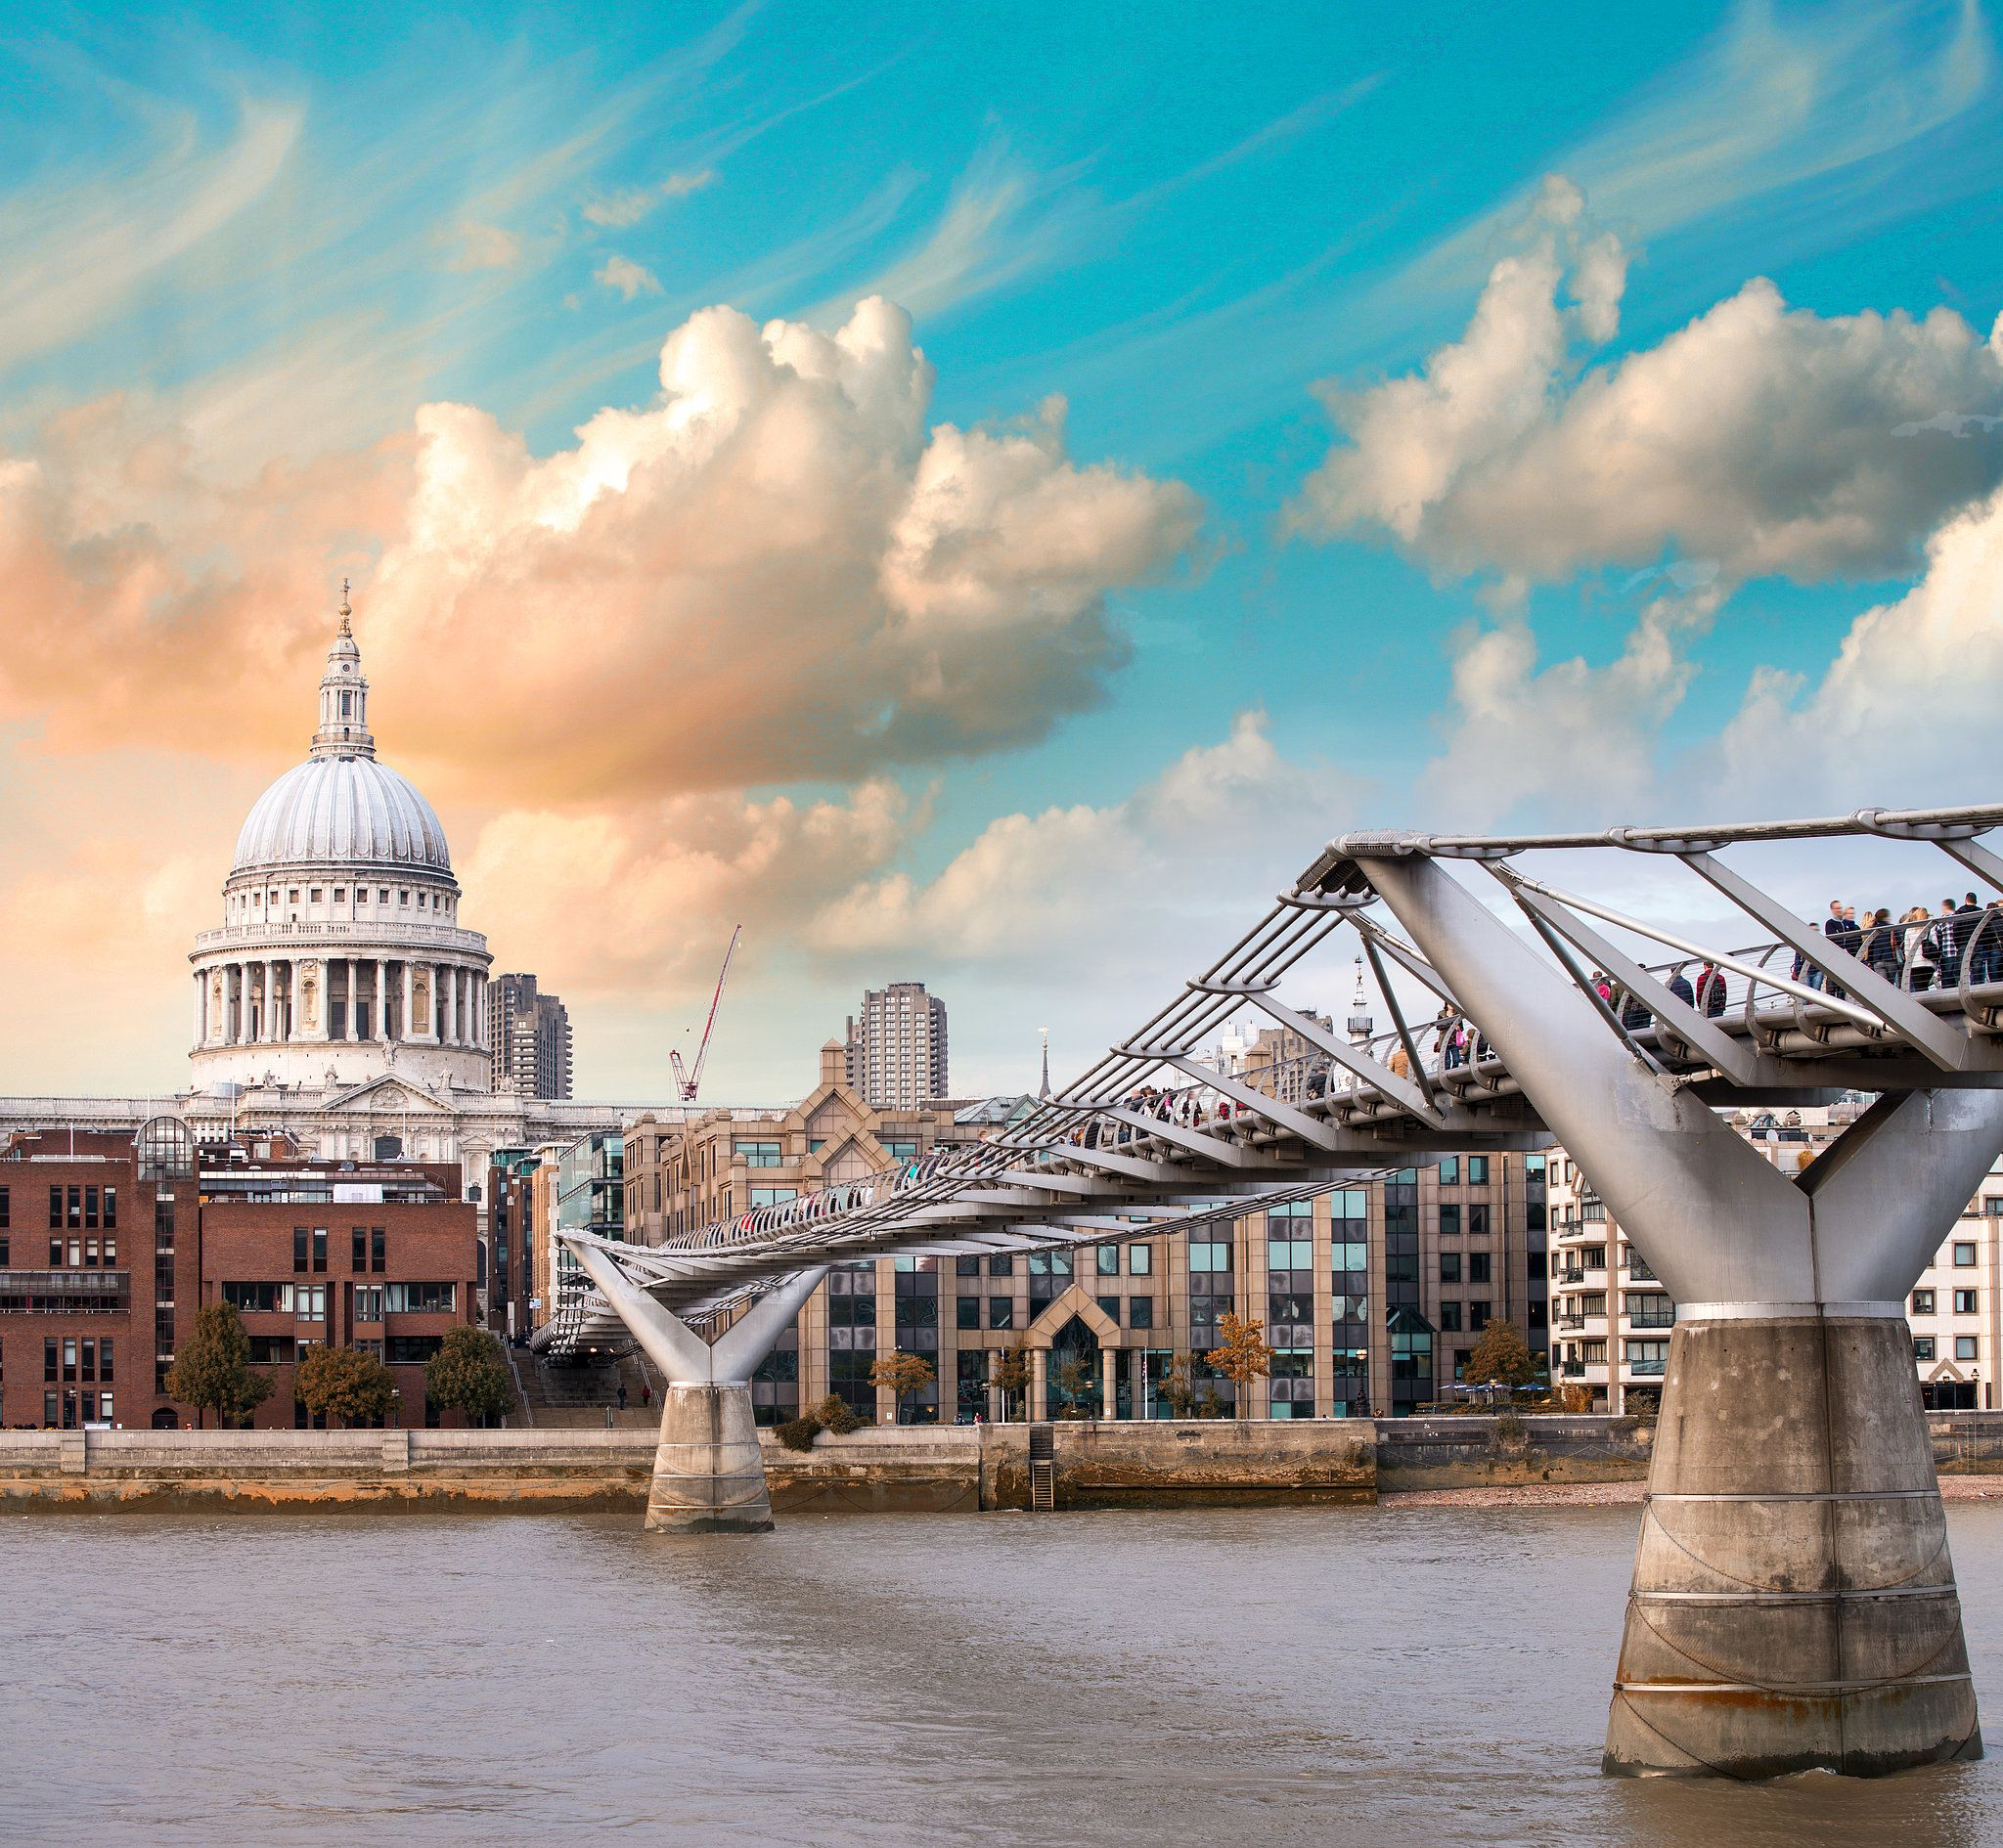 Millennium Bridge London Harry Potter Travel Harry Potter Travel Bucket List Travel